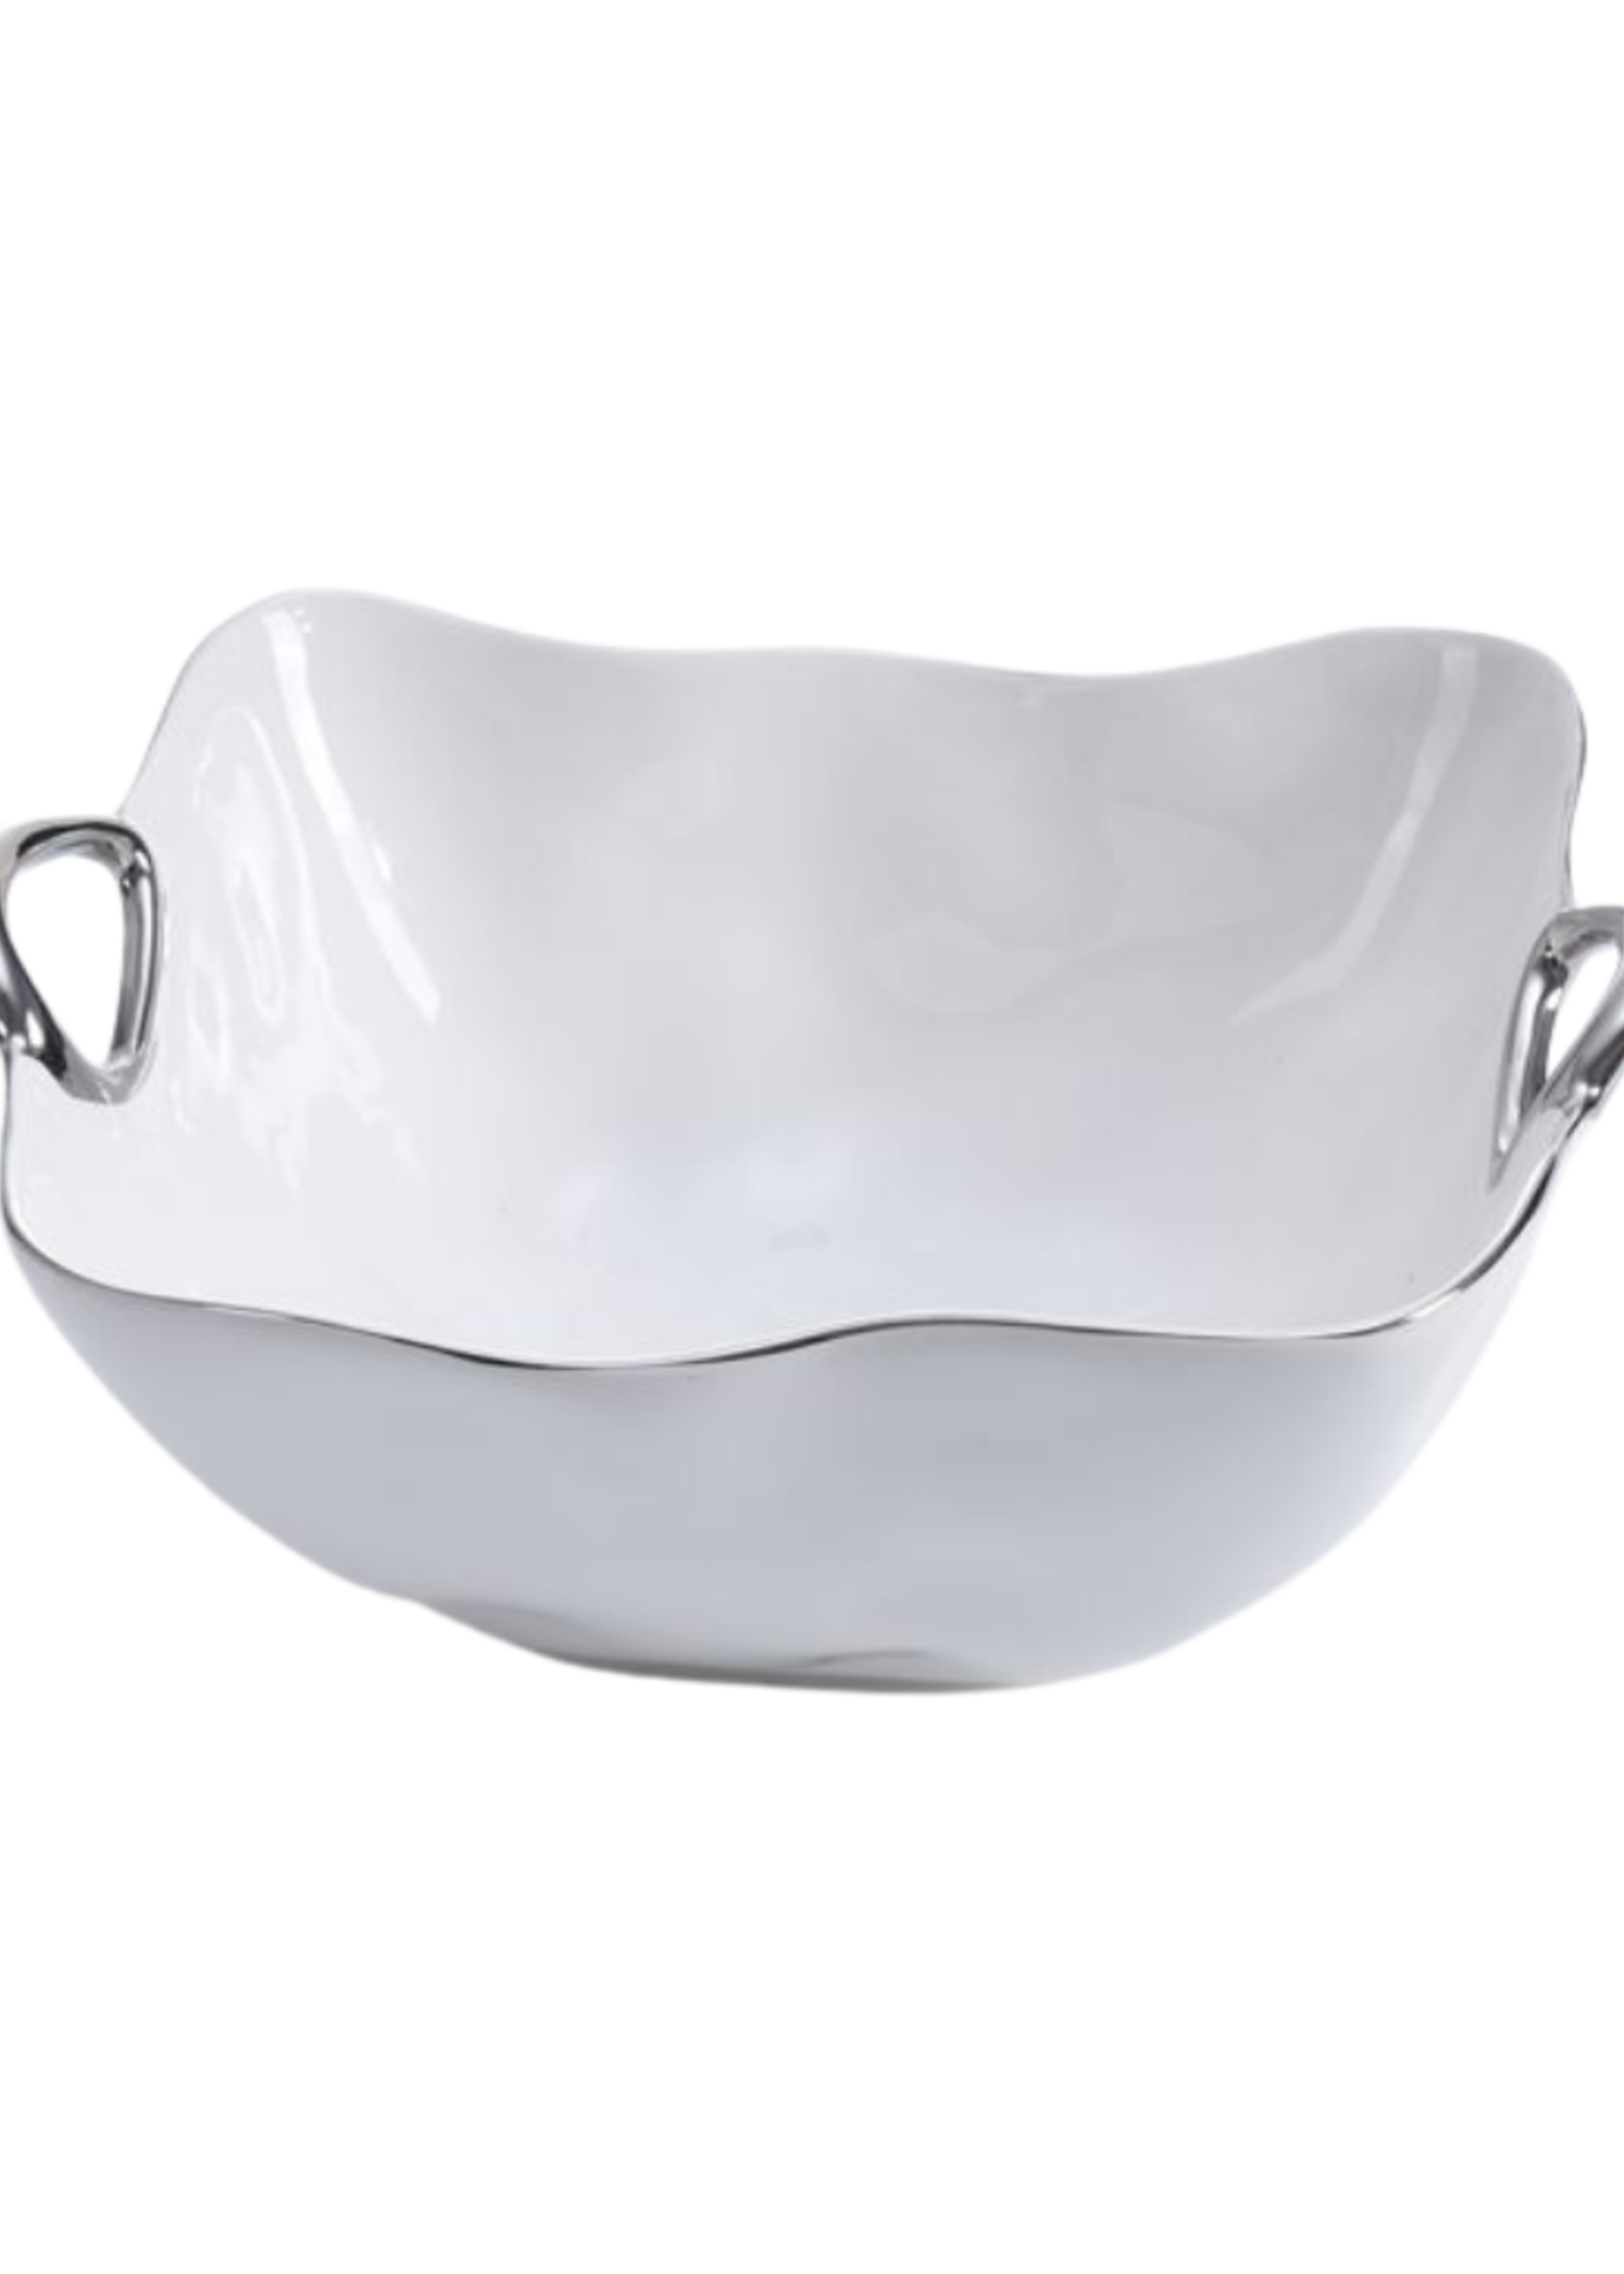 White Porcelain Large Bowl w/ Silver Handles